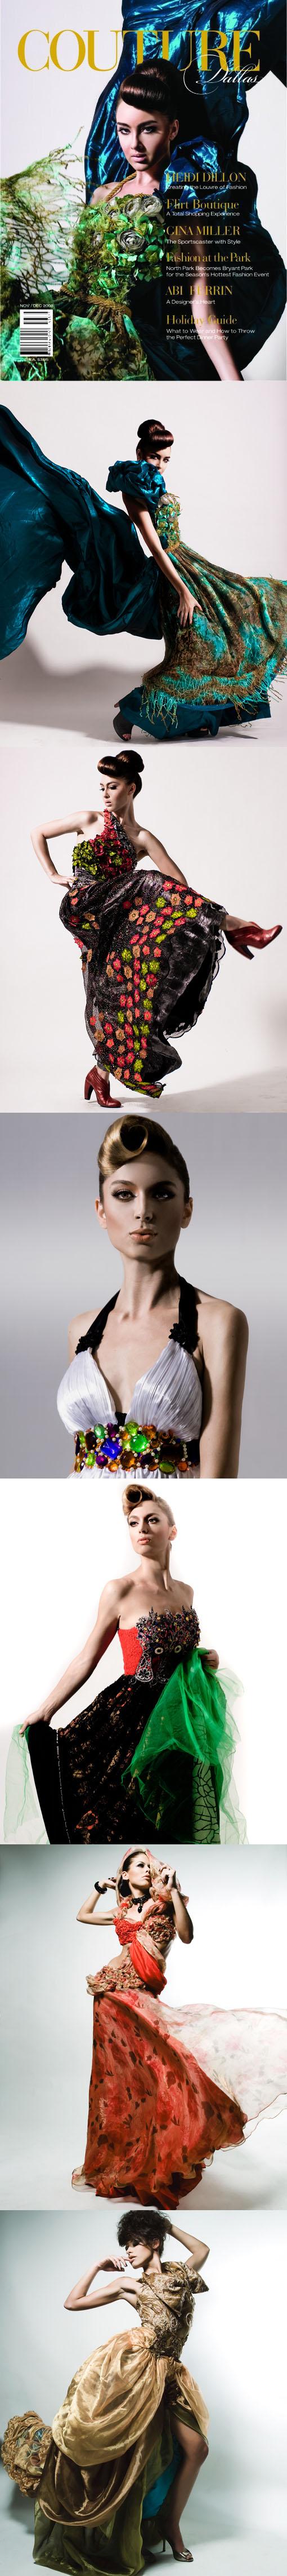 LA Apr 12, 2009 Client:  Couture Dallas magazine Photographer:  Mark Sacro